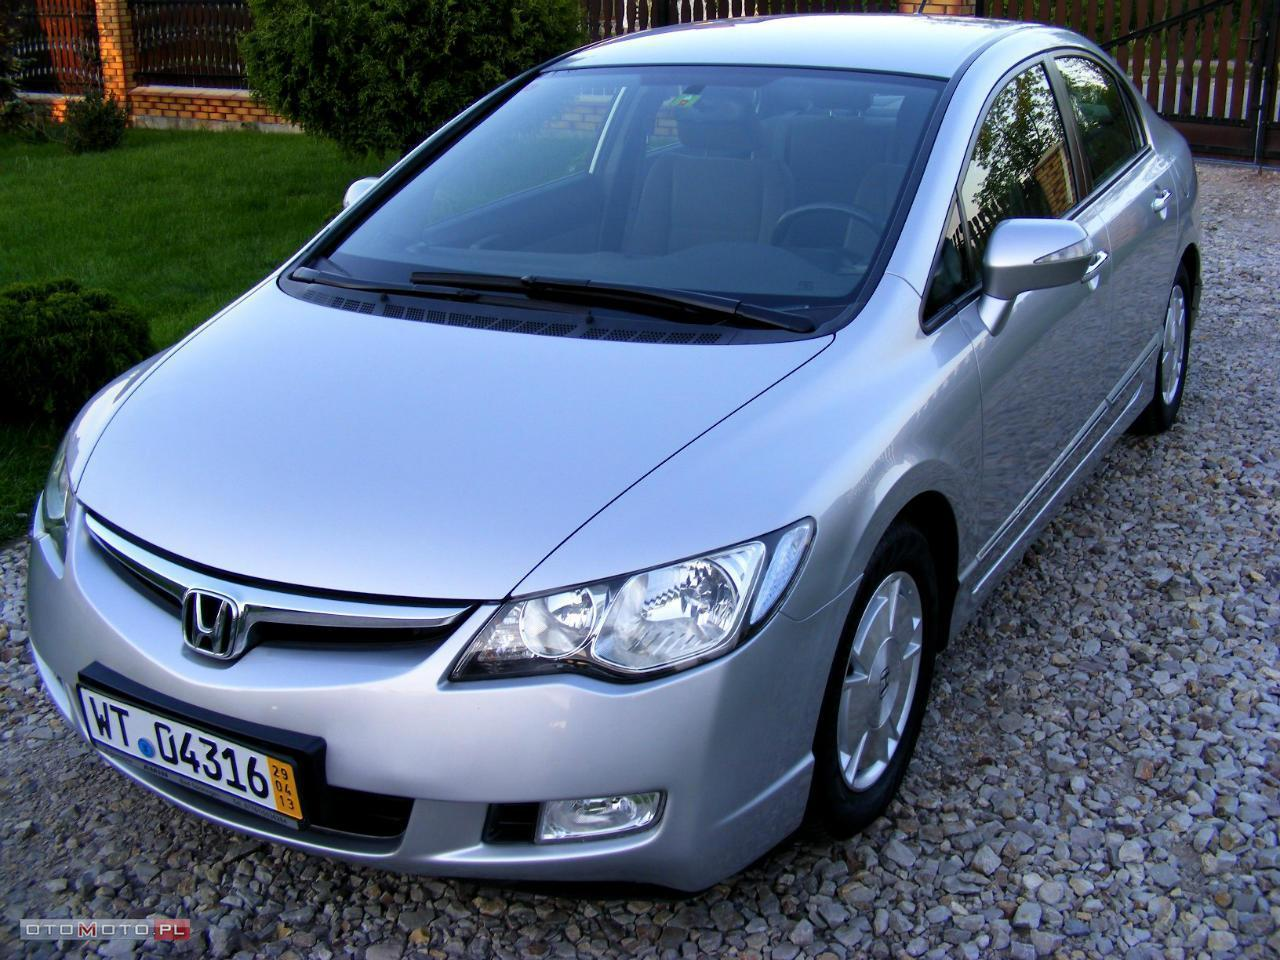 Honda Civic 1,3 ze Szwajcarii